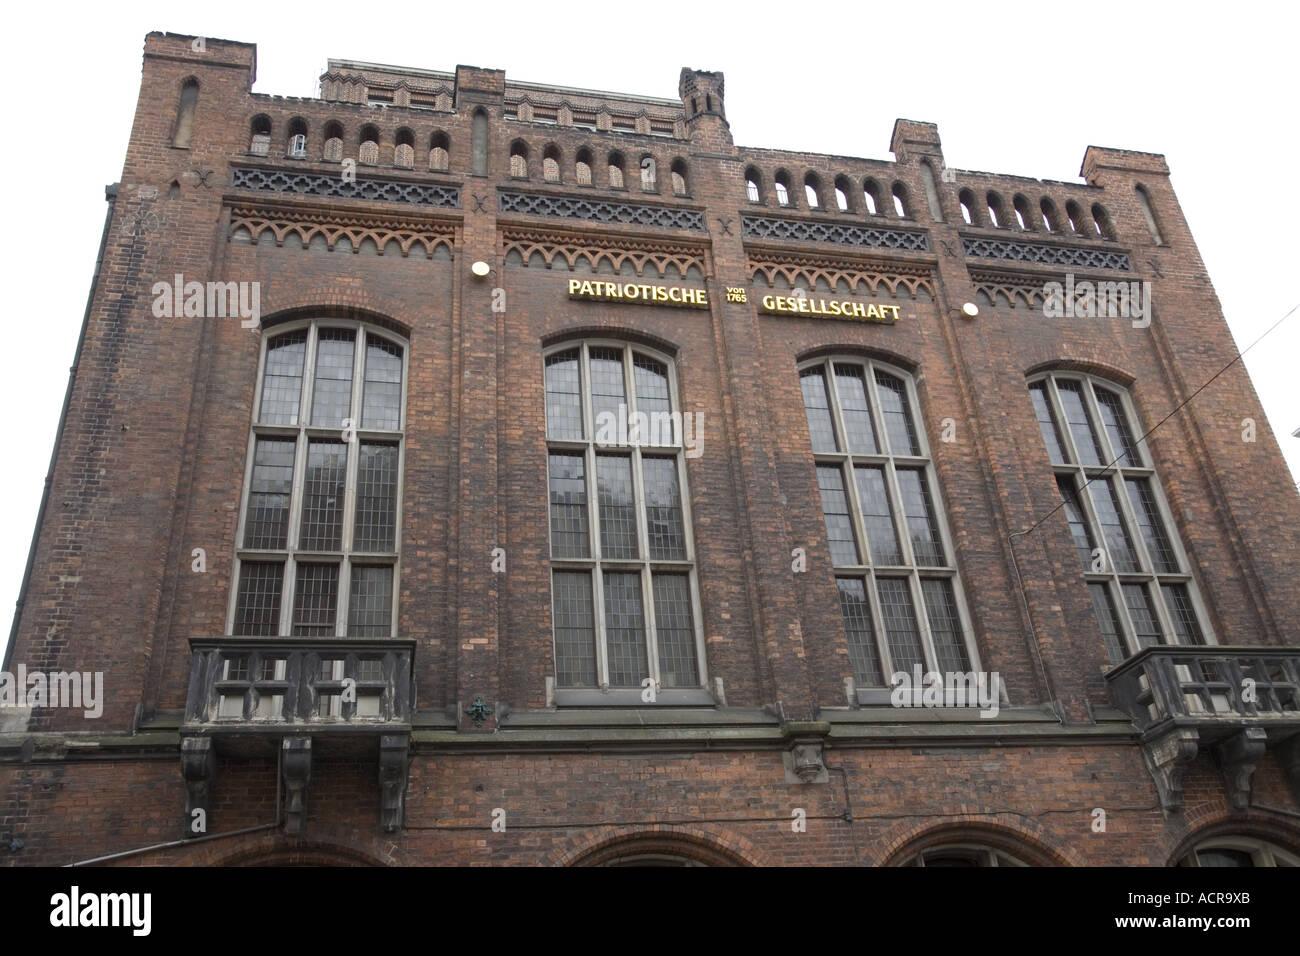 Patriotische Gesellschaft , Hamburg, Germany Stock Photo